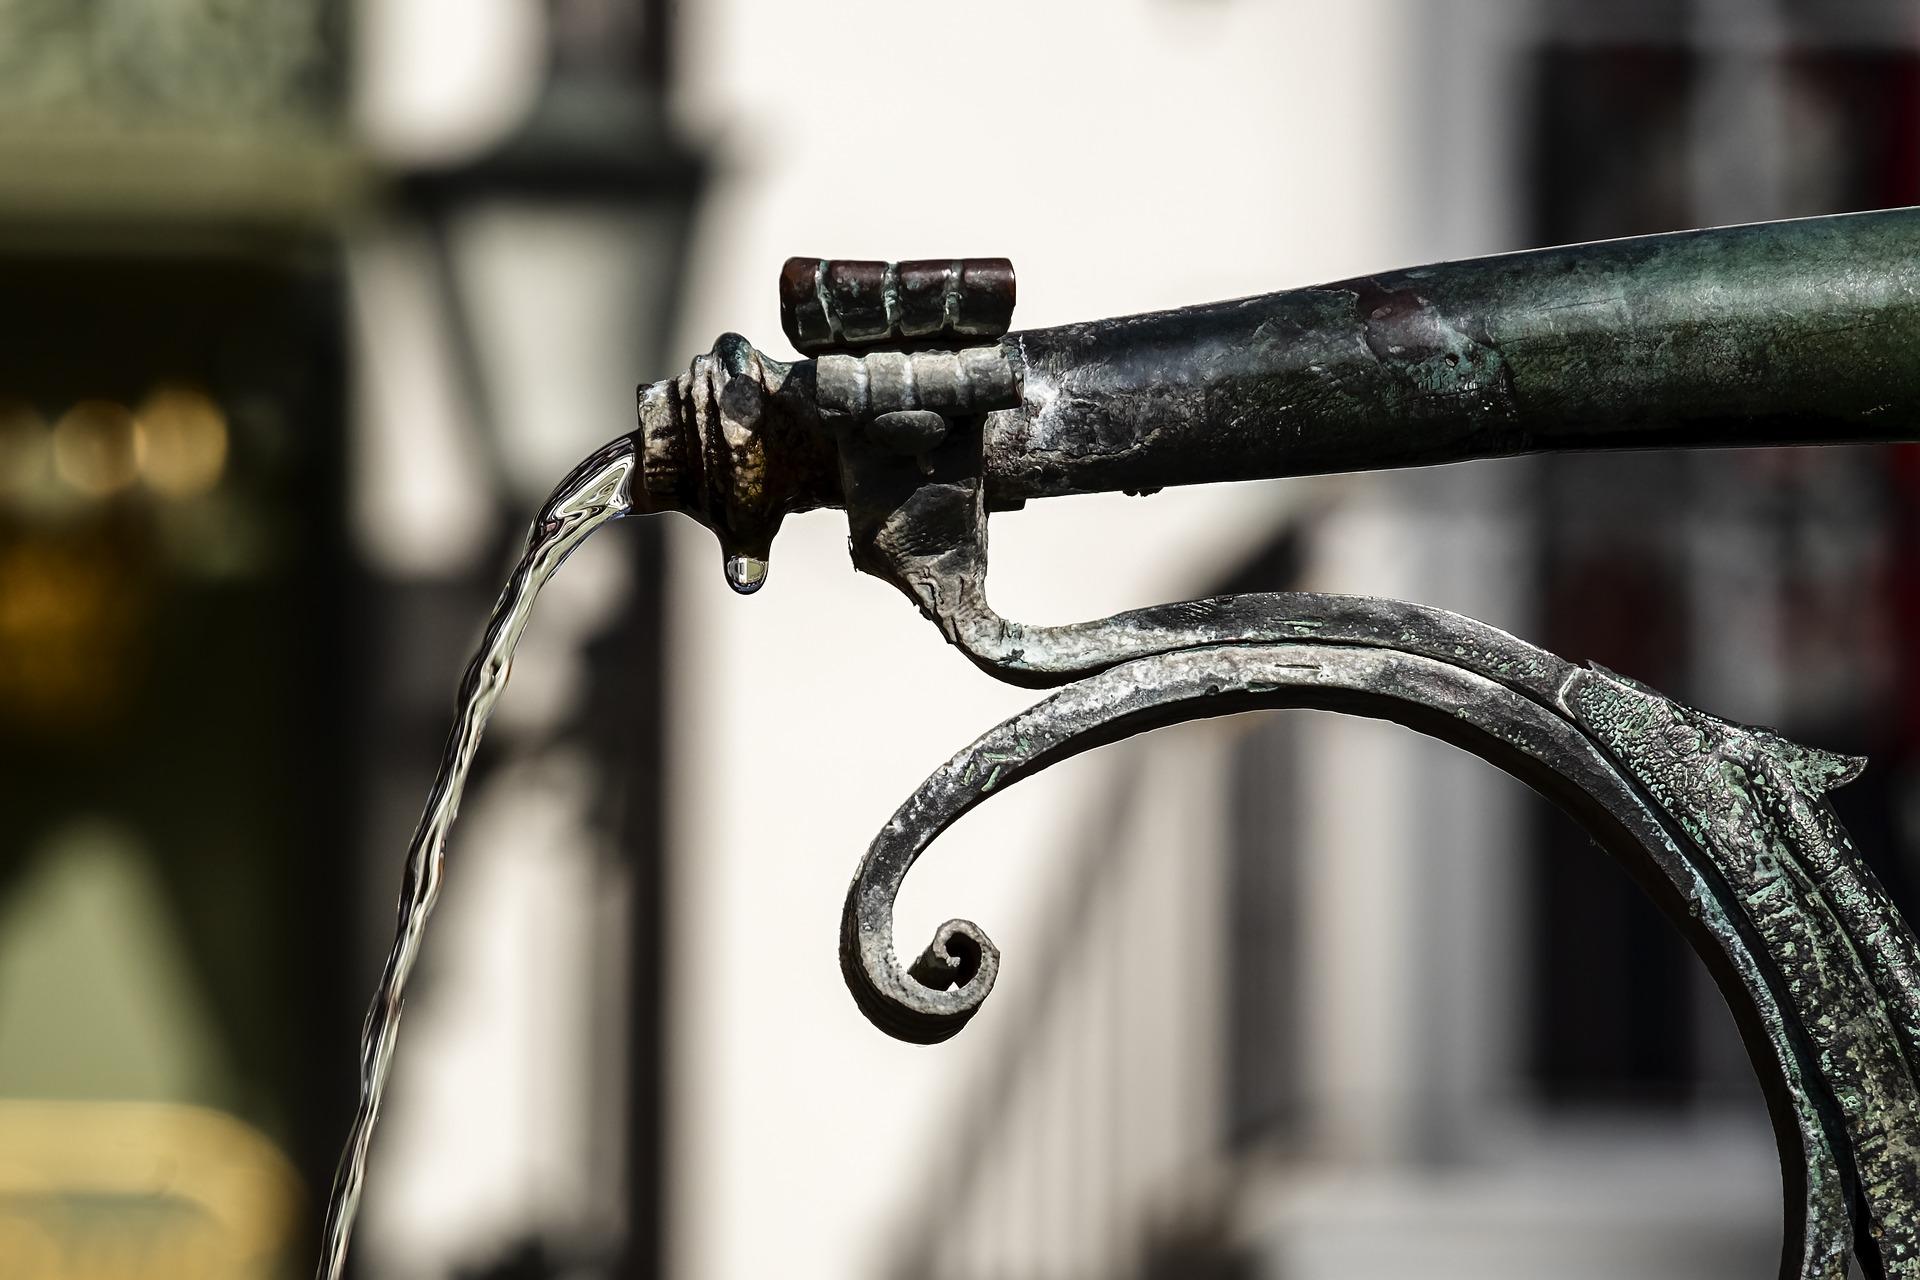 Faucet shooting water